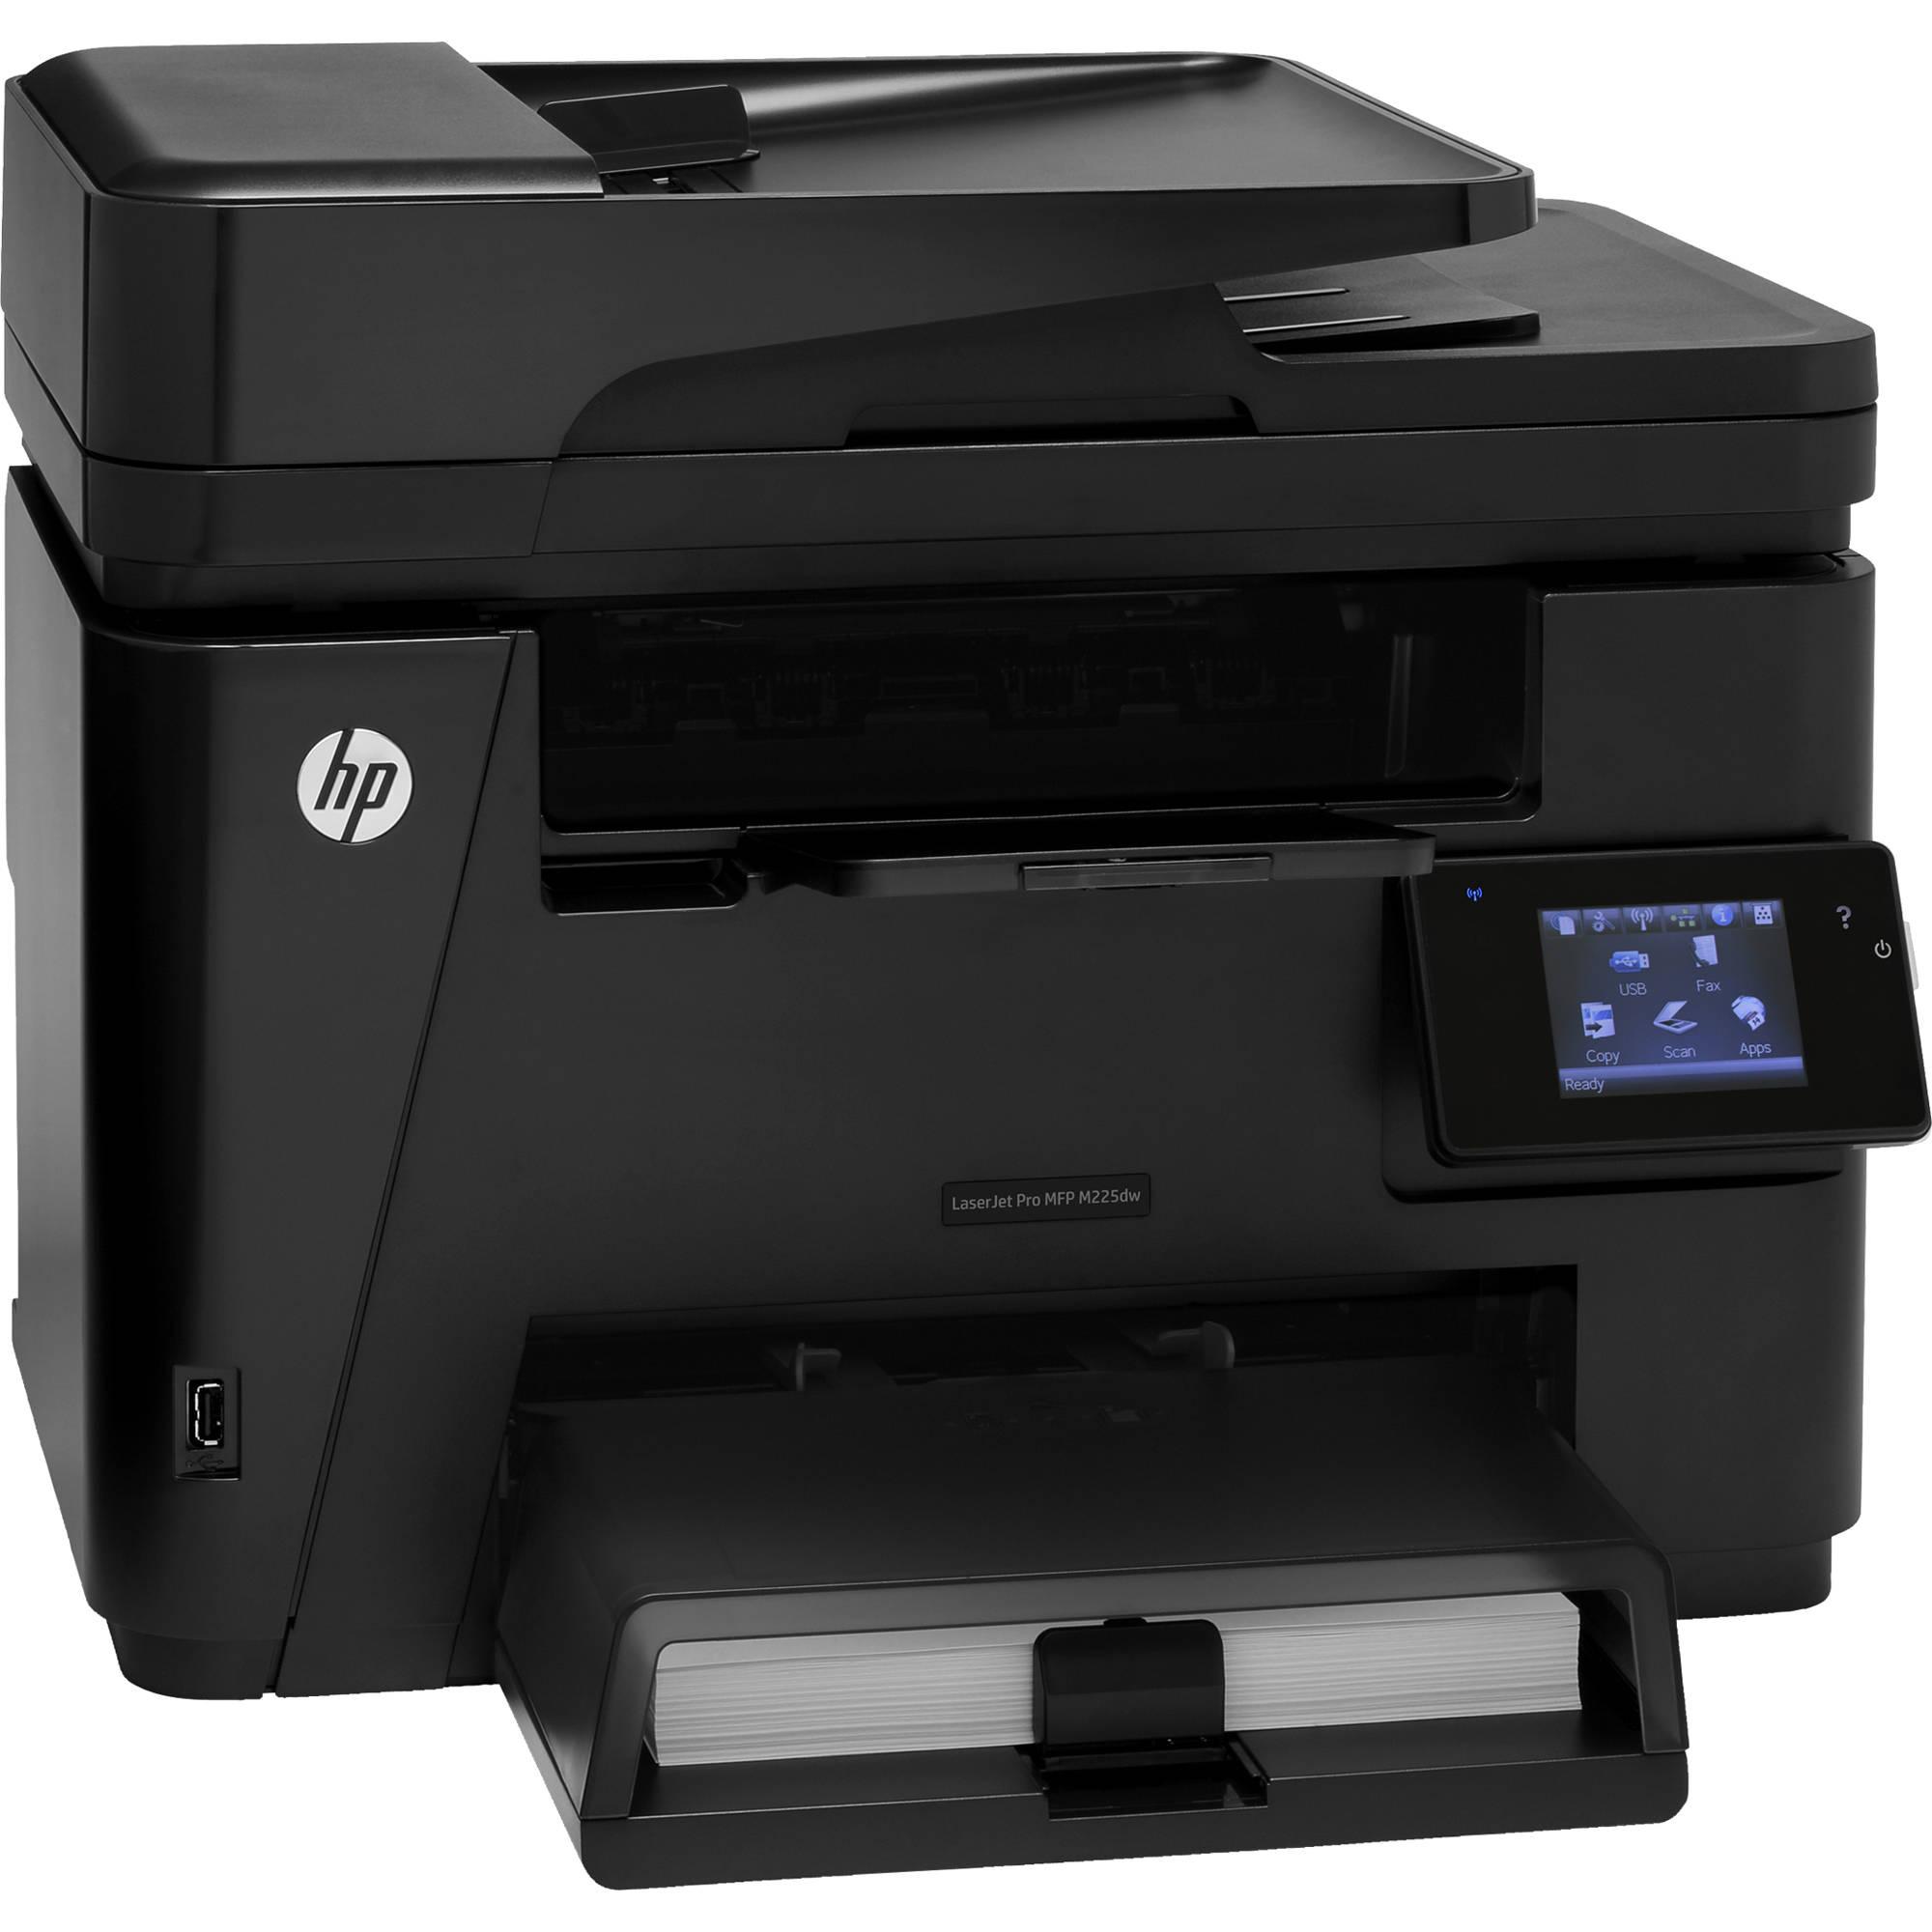 HP M225dw LaserJet Pro All-in-One Laser Printer CF485A B&H ...